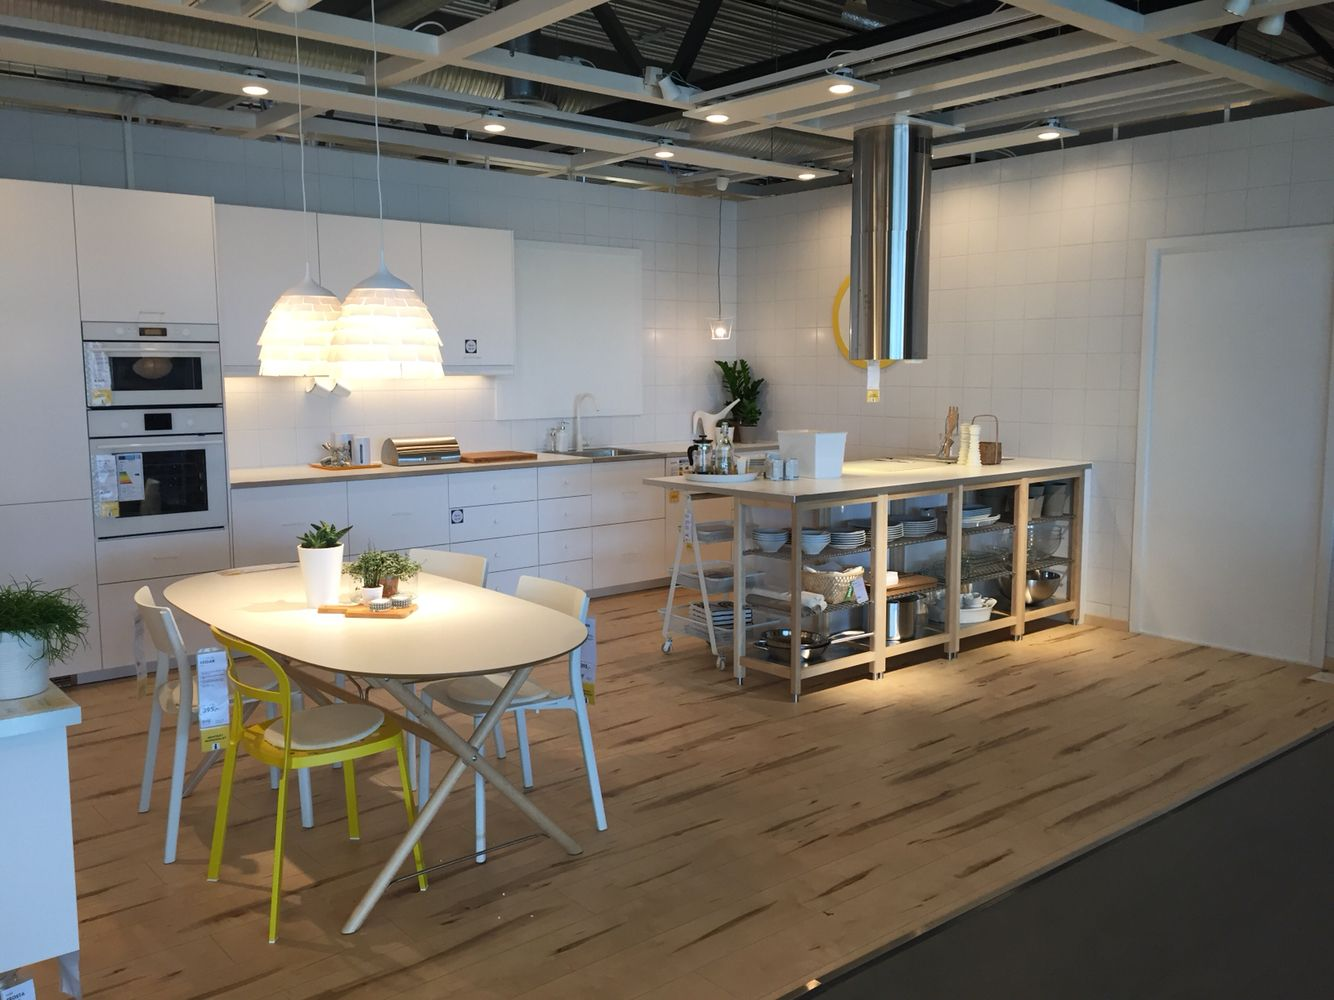 My First Kitchen New Product Skaralid Ikea Skaralid Catalogue 2016 Home Decor Kitchen New Homes